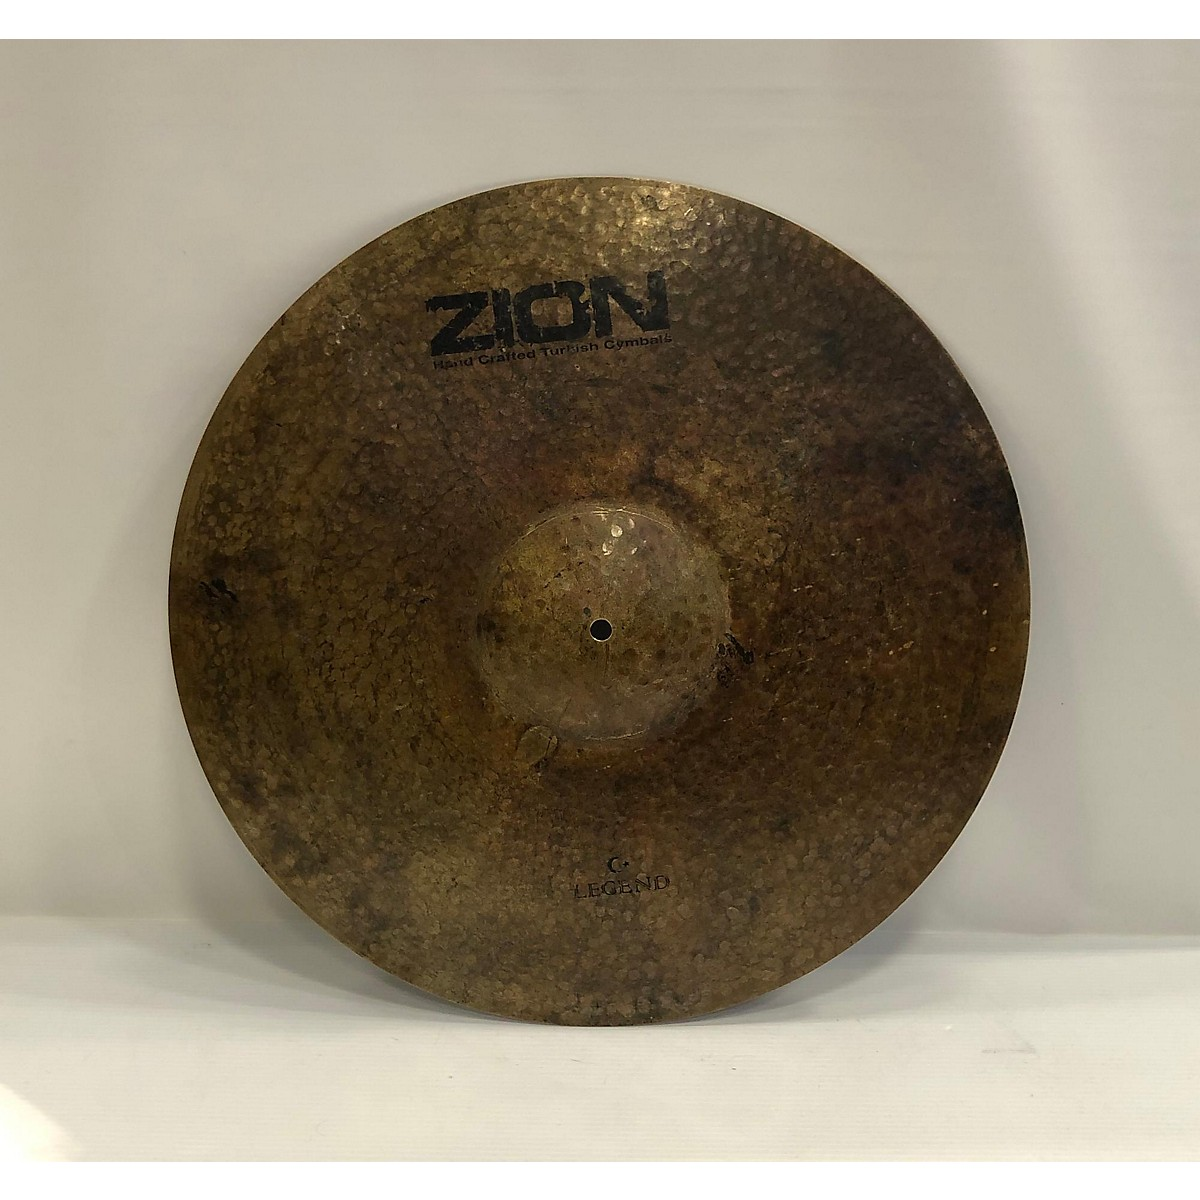 Zion 21in Legend Ride Cymbal